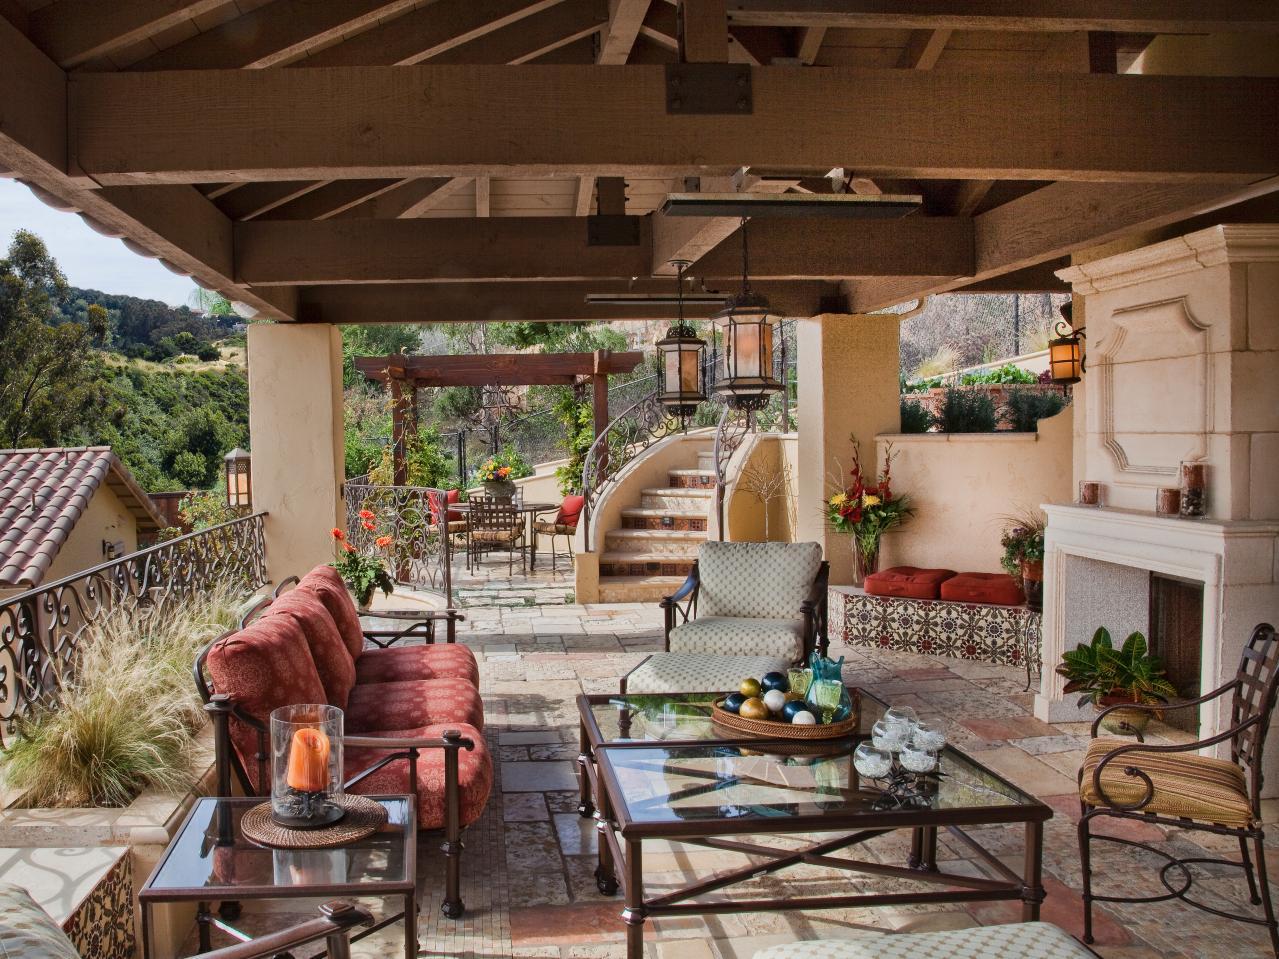 outdoor living courtyard dining PSXTPCK